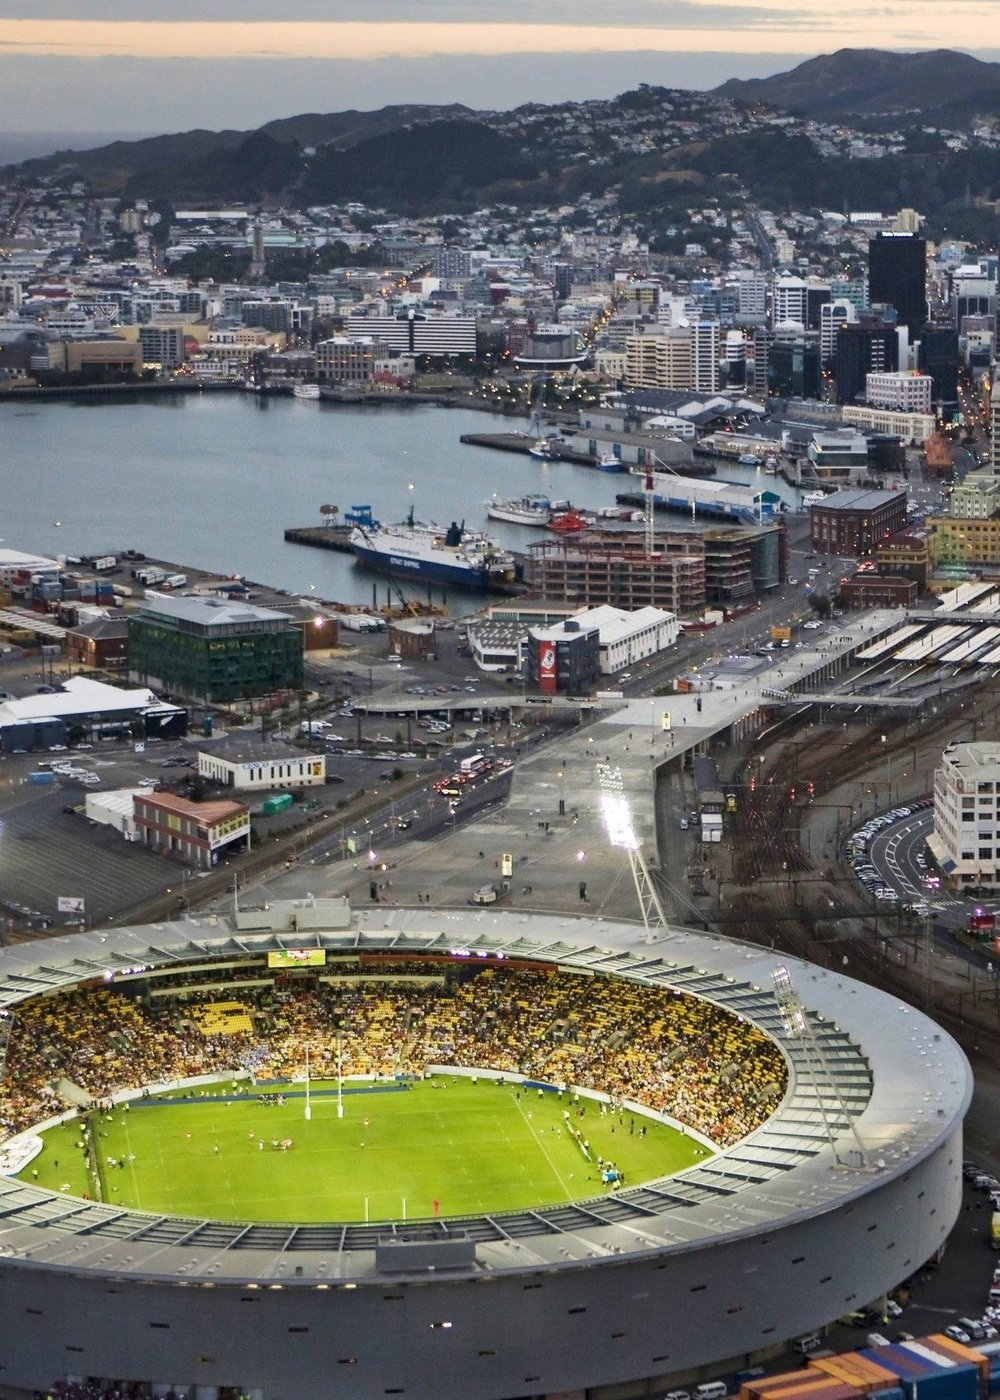 Port-stadium-at-dusk-Wellington-city-walking-tour-2014-05-11-34.jpg